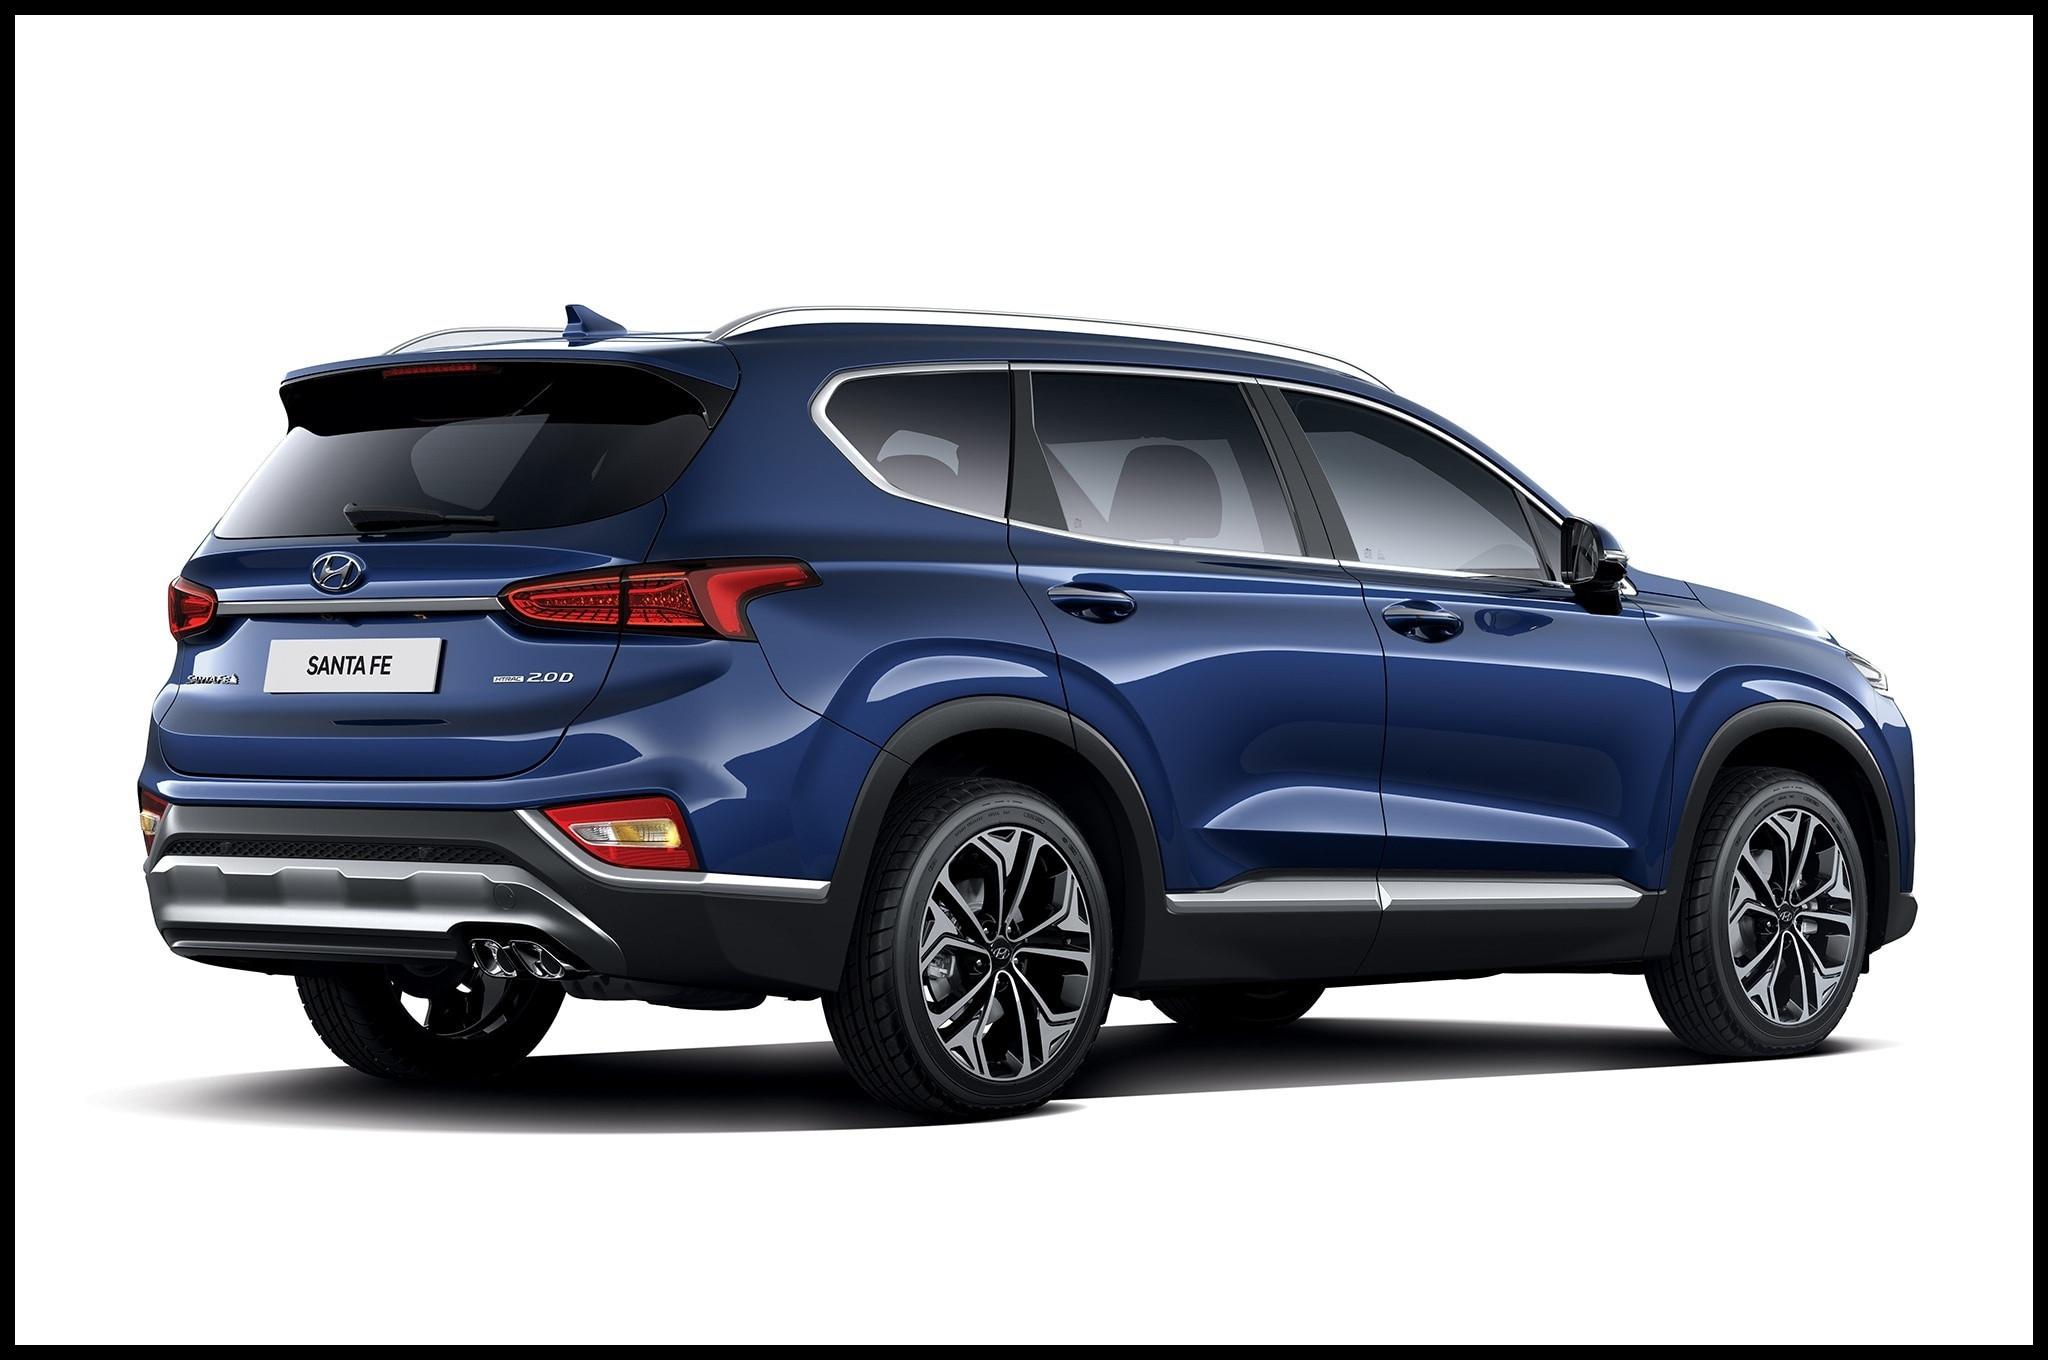 Gallery of the Tucson 2019 Hyundai